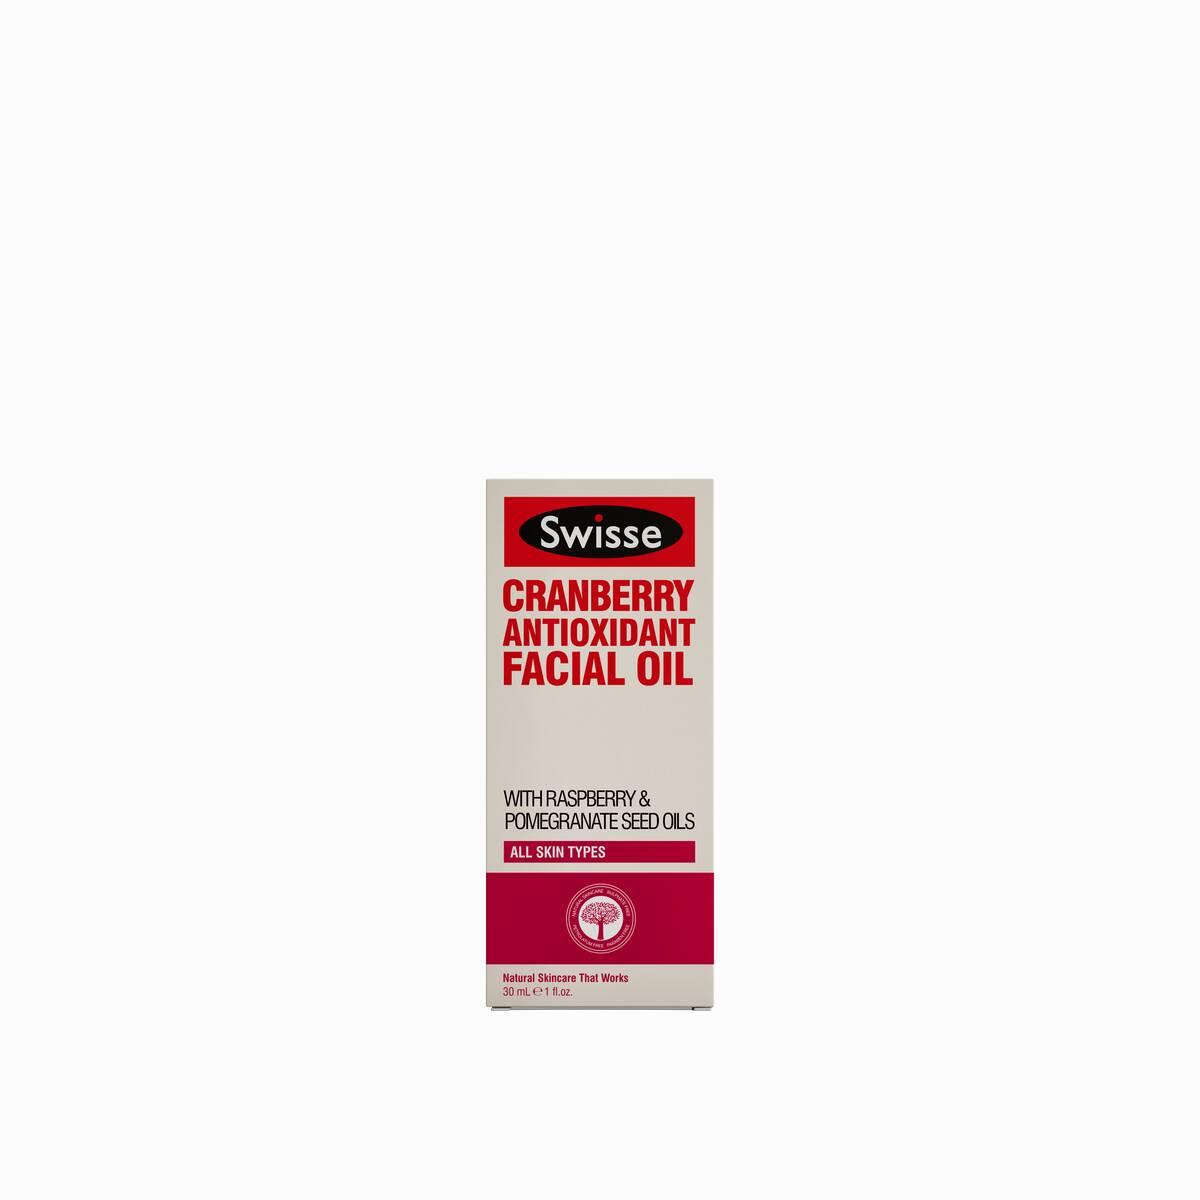 Swisse skincare oils Cranberry Antioxidant Oil carton pack shot